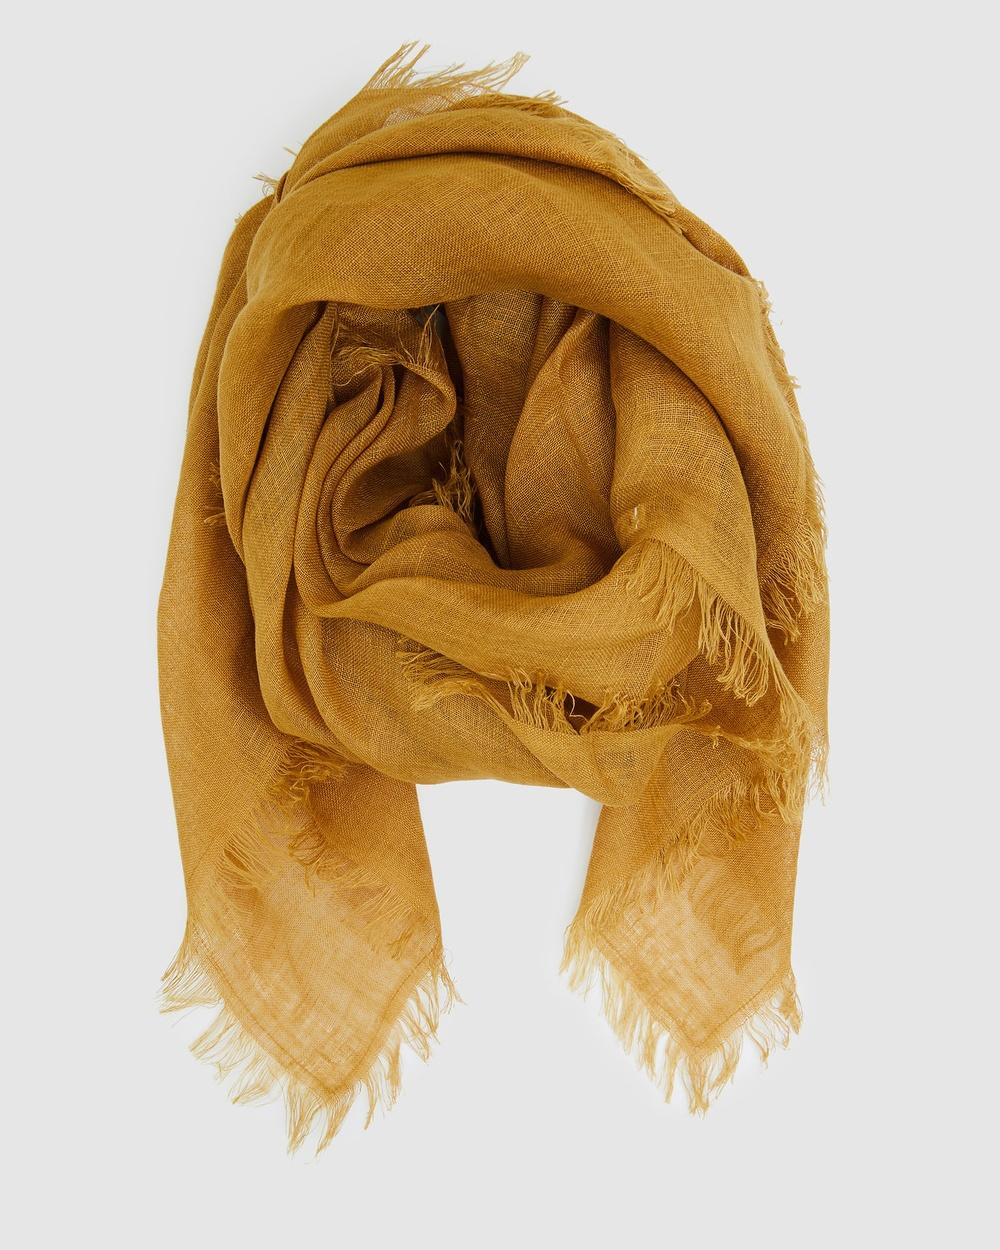 Cloth & Co. Hand Loomed Linen Scarf Scarves Gloves Turmeric